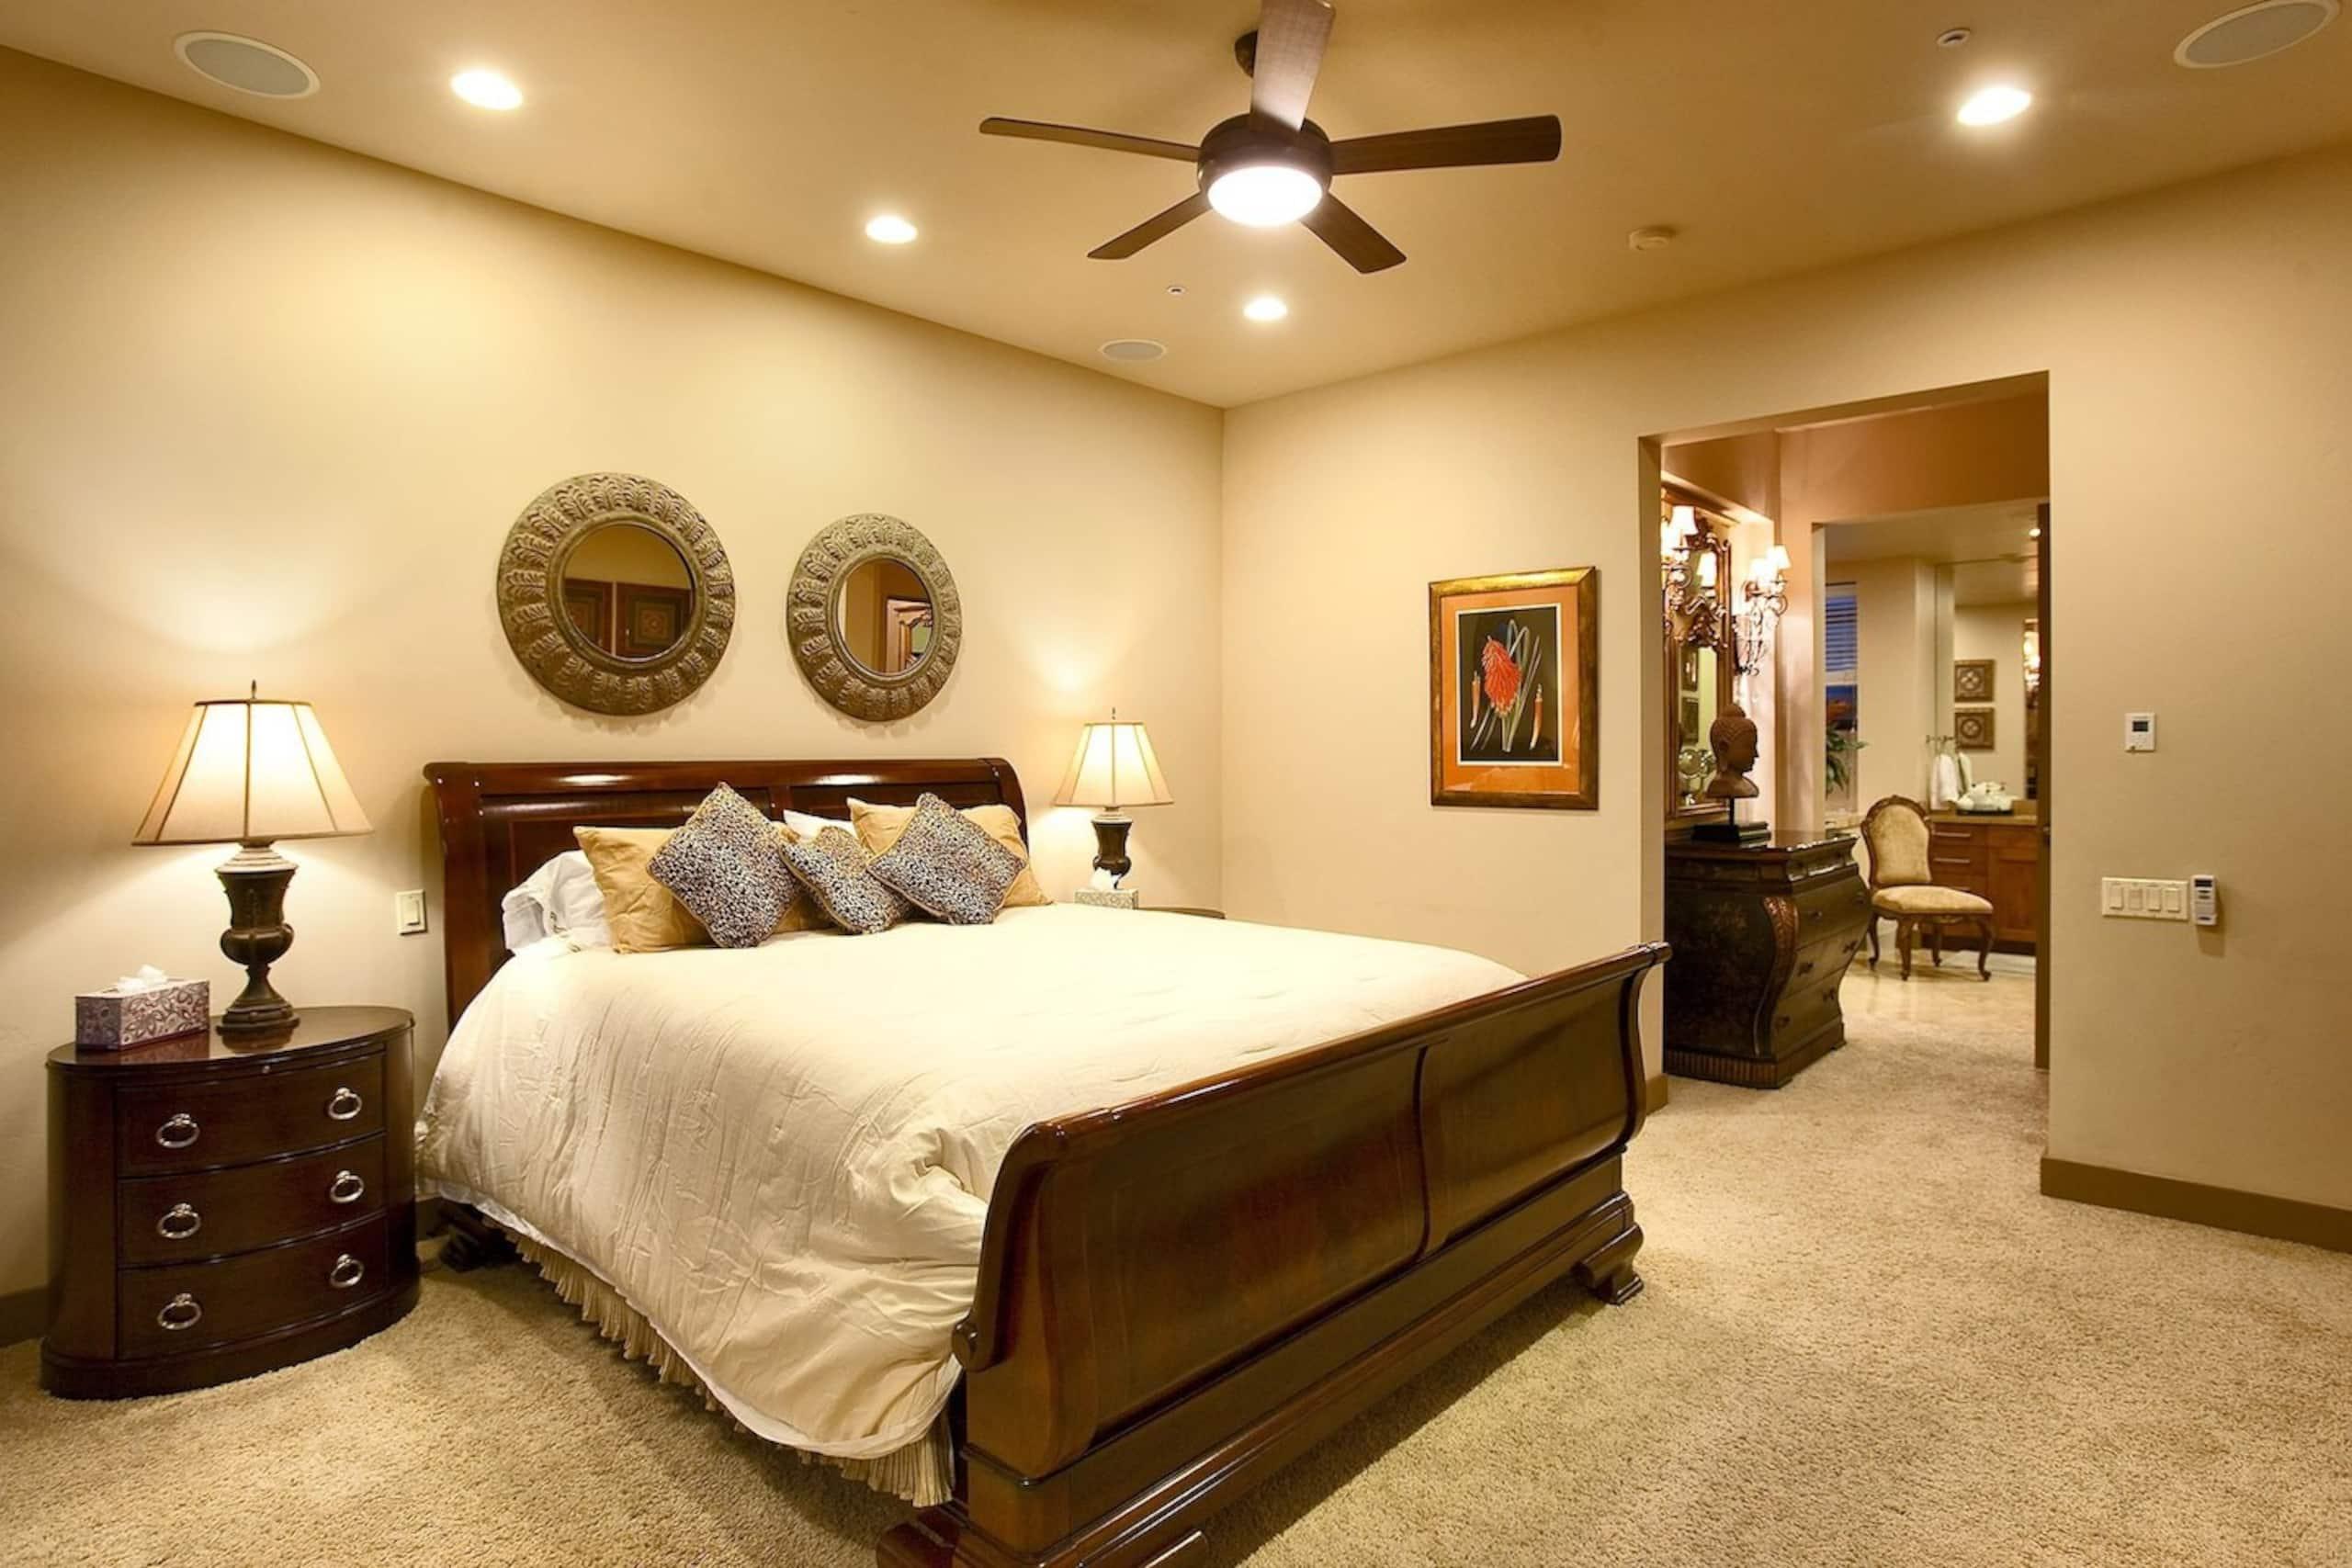 Apartment Villa Elmo - Marvelous 5 Bedrooms photo 20278922